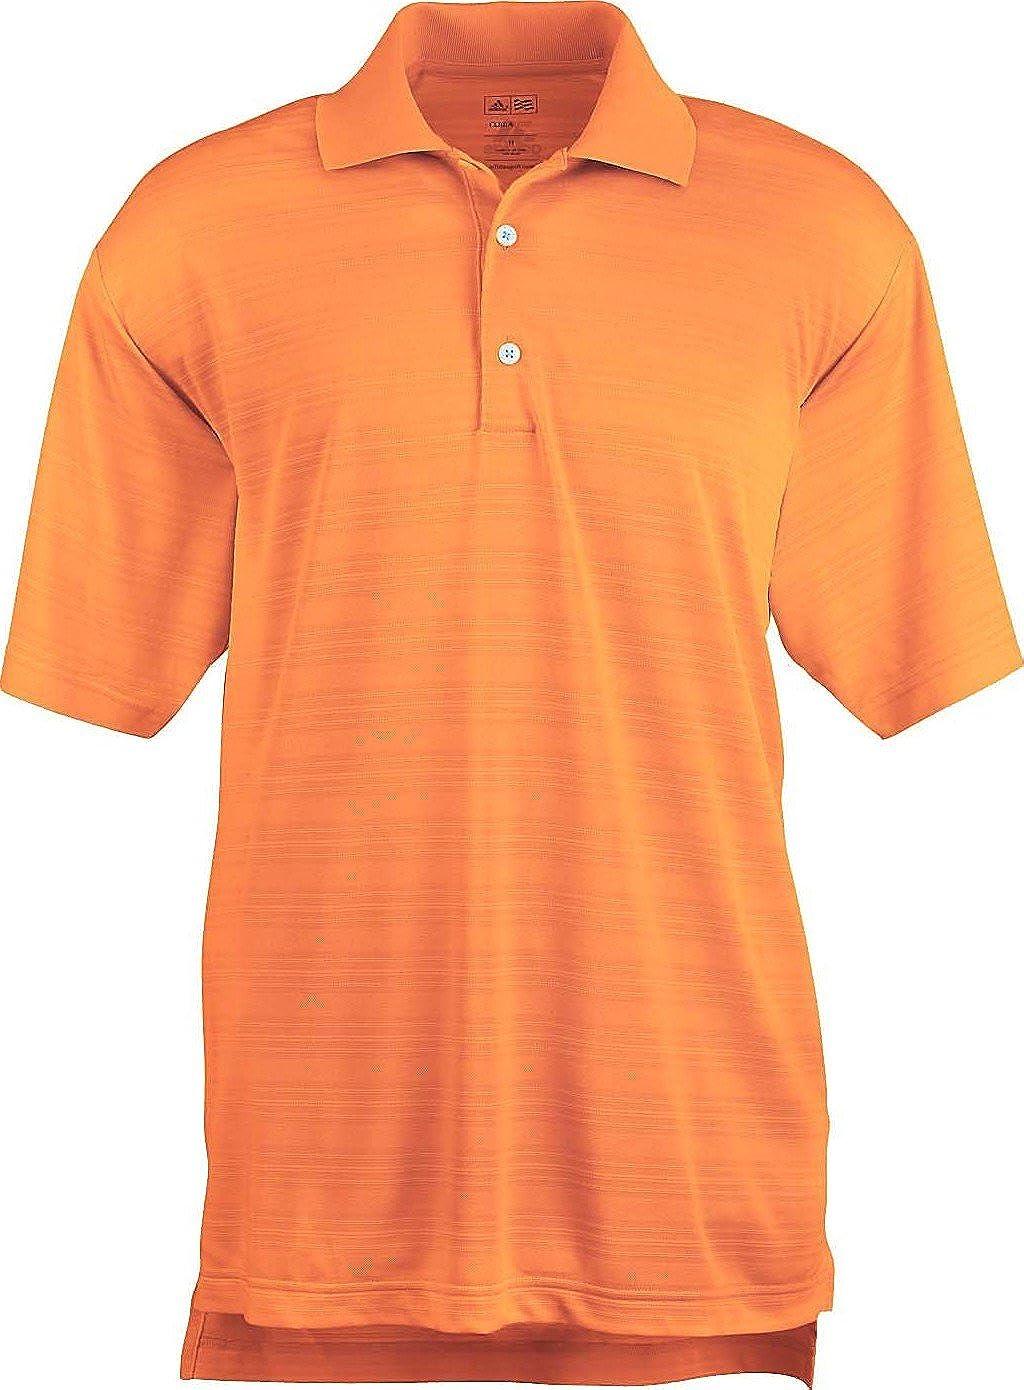 Orange XXL adidas pour Homme Climalite texturé Solide Polo